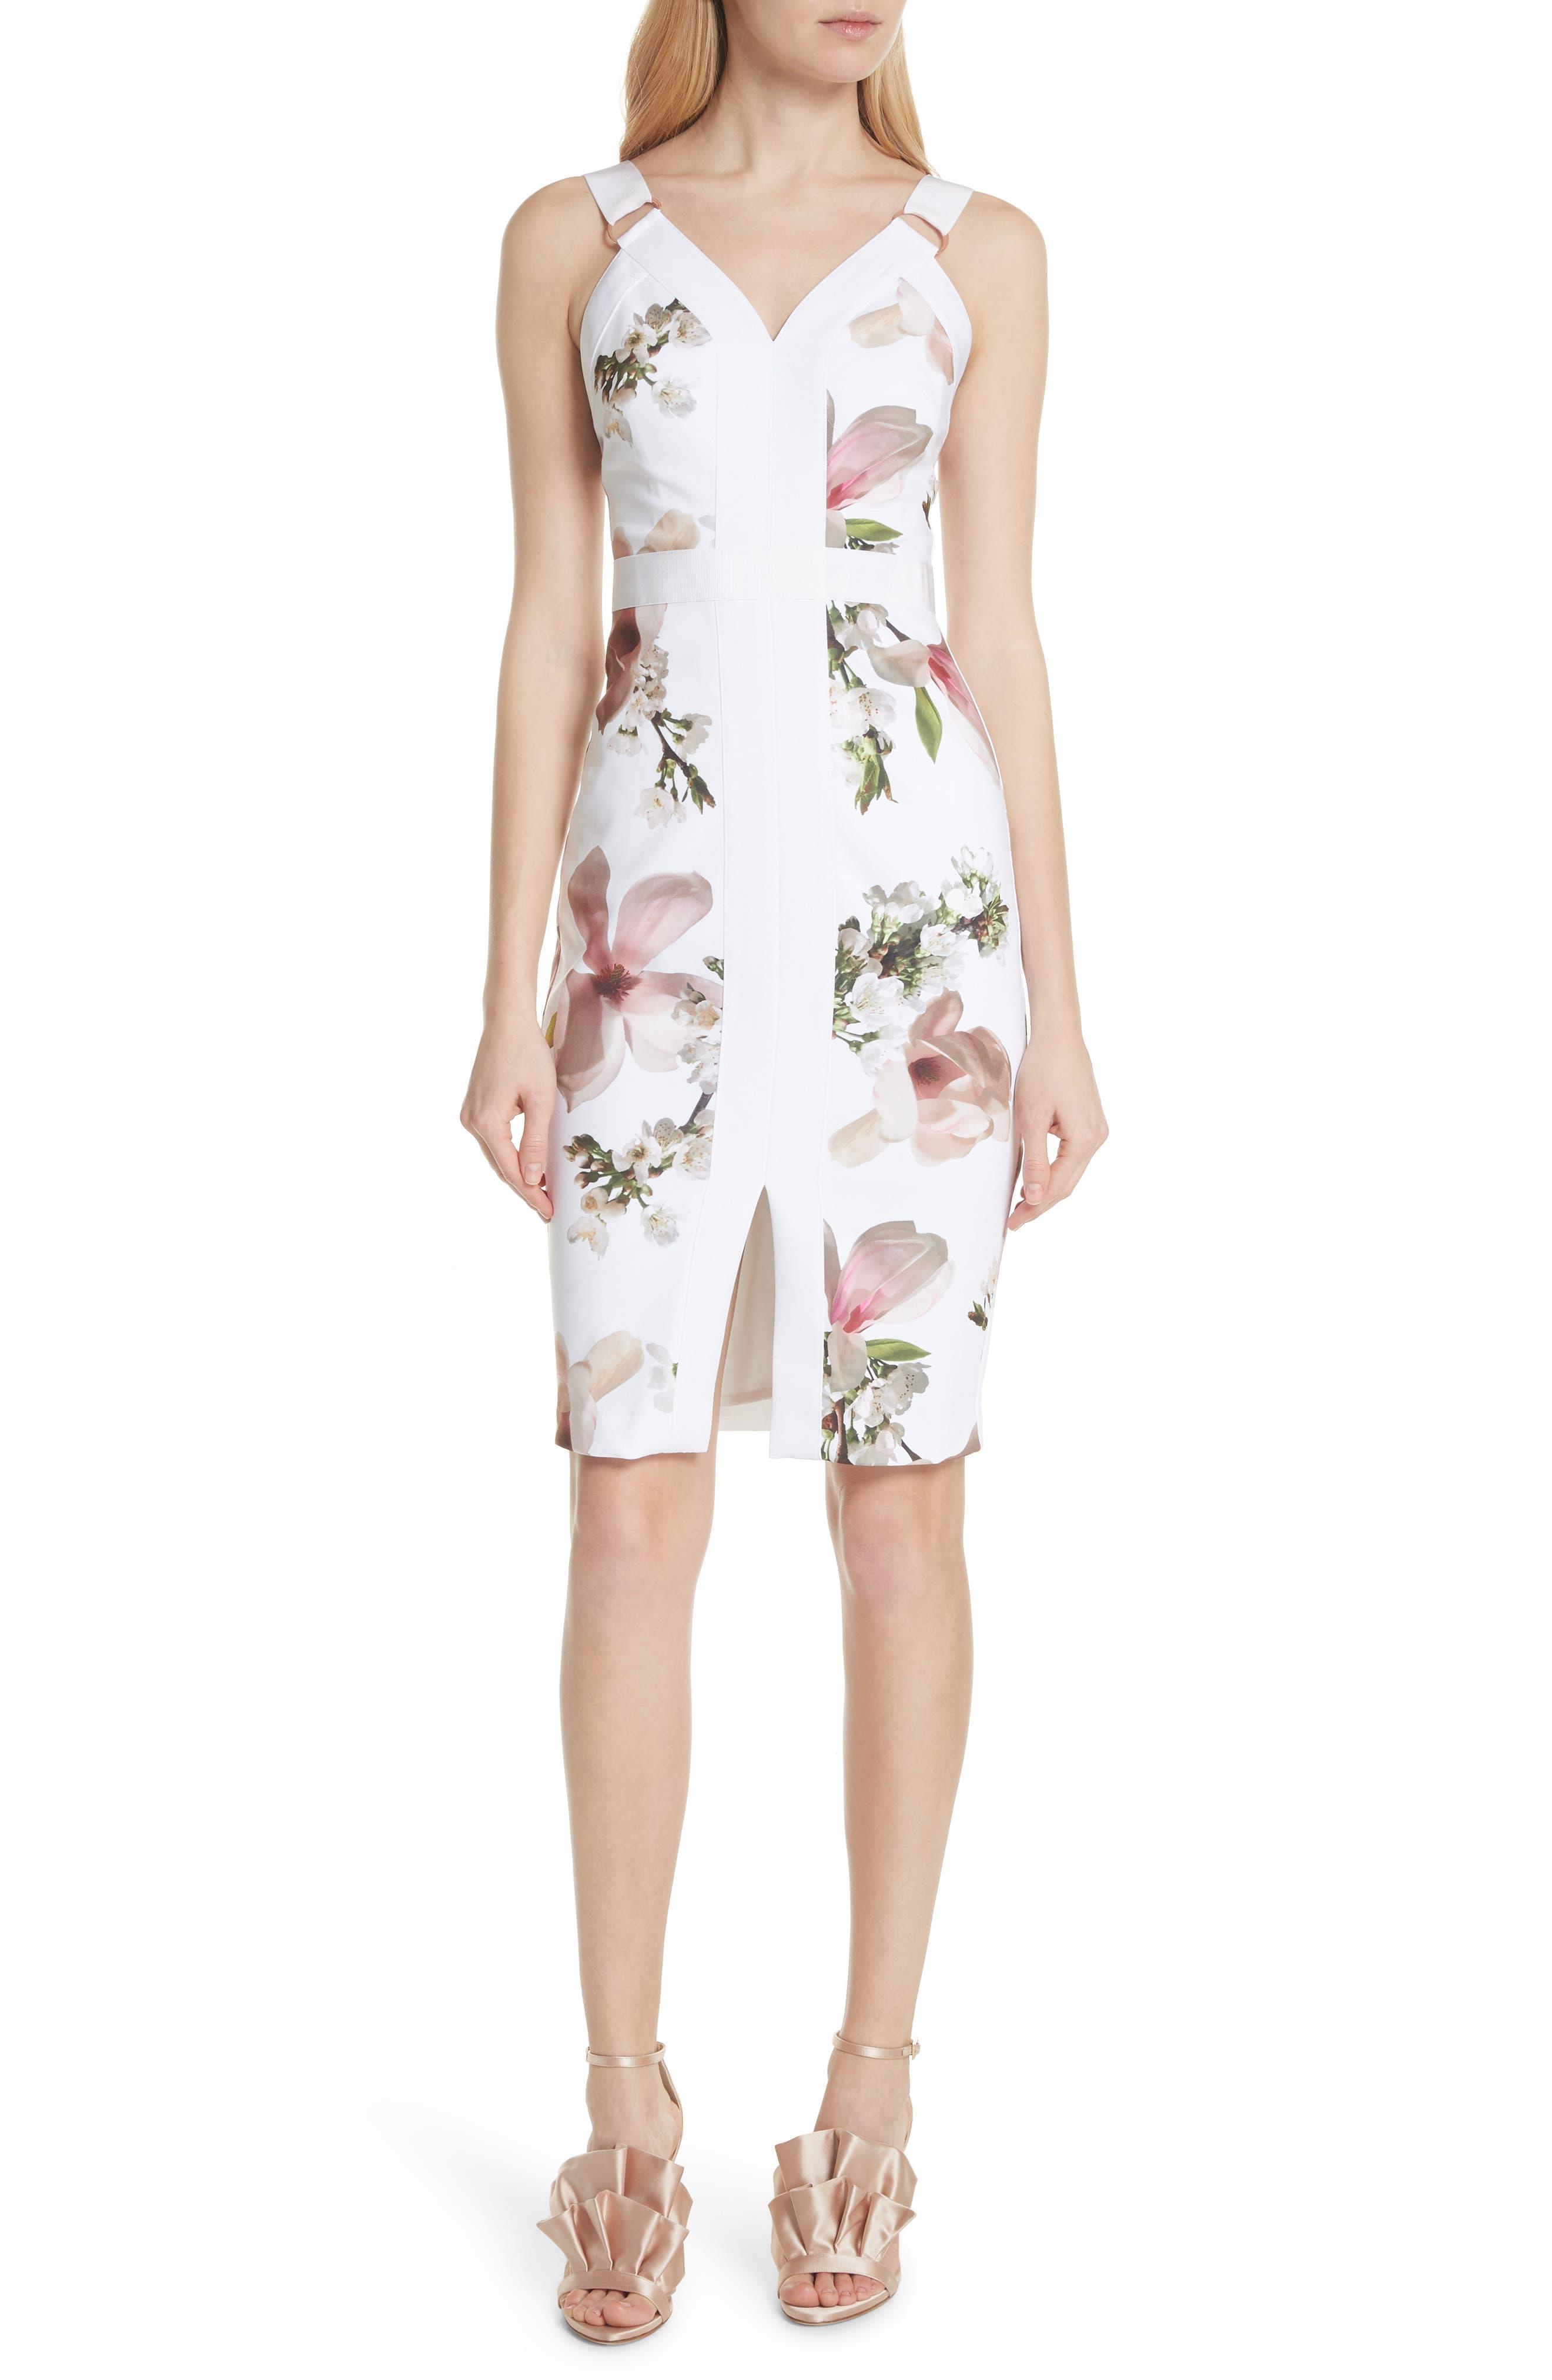 Harmony Floral Sheath Dress,                             Main thumbnail 1, color,                             110